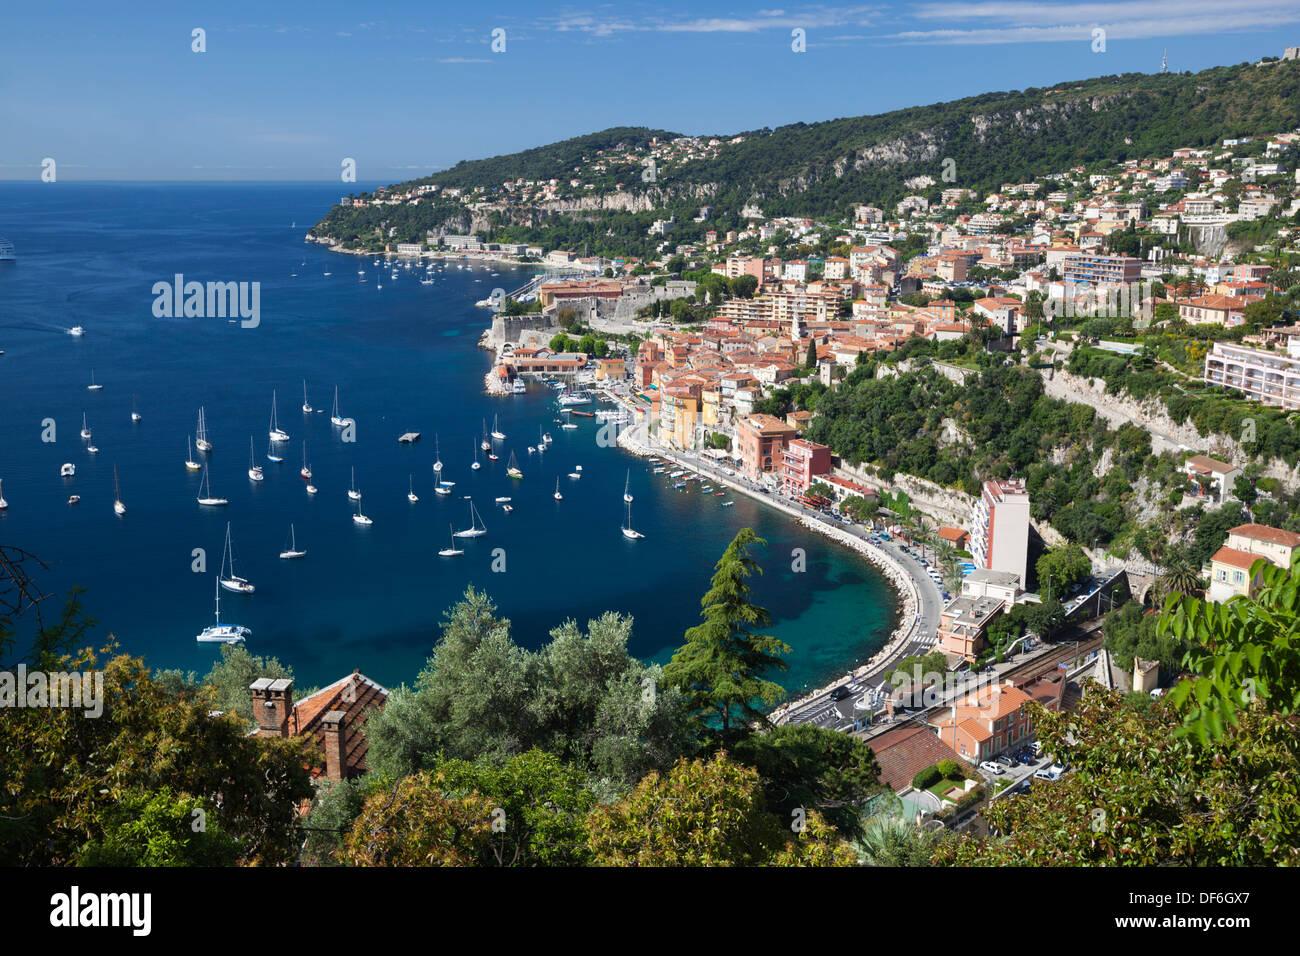 Villefranche-sur-Mer, Provence-Alpes-Cote d'Azur, France, Europe - Stock Image